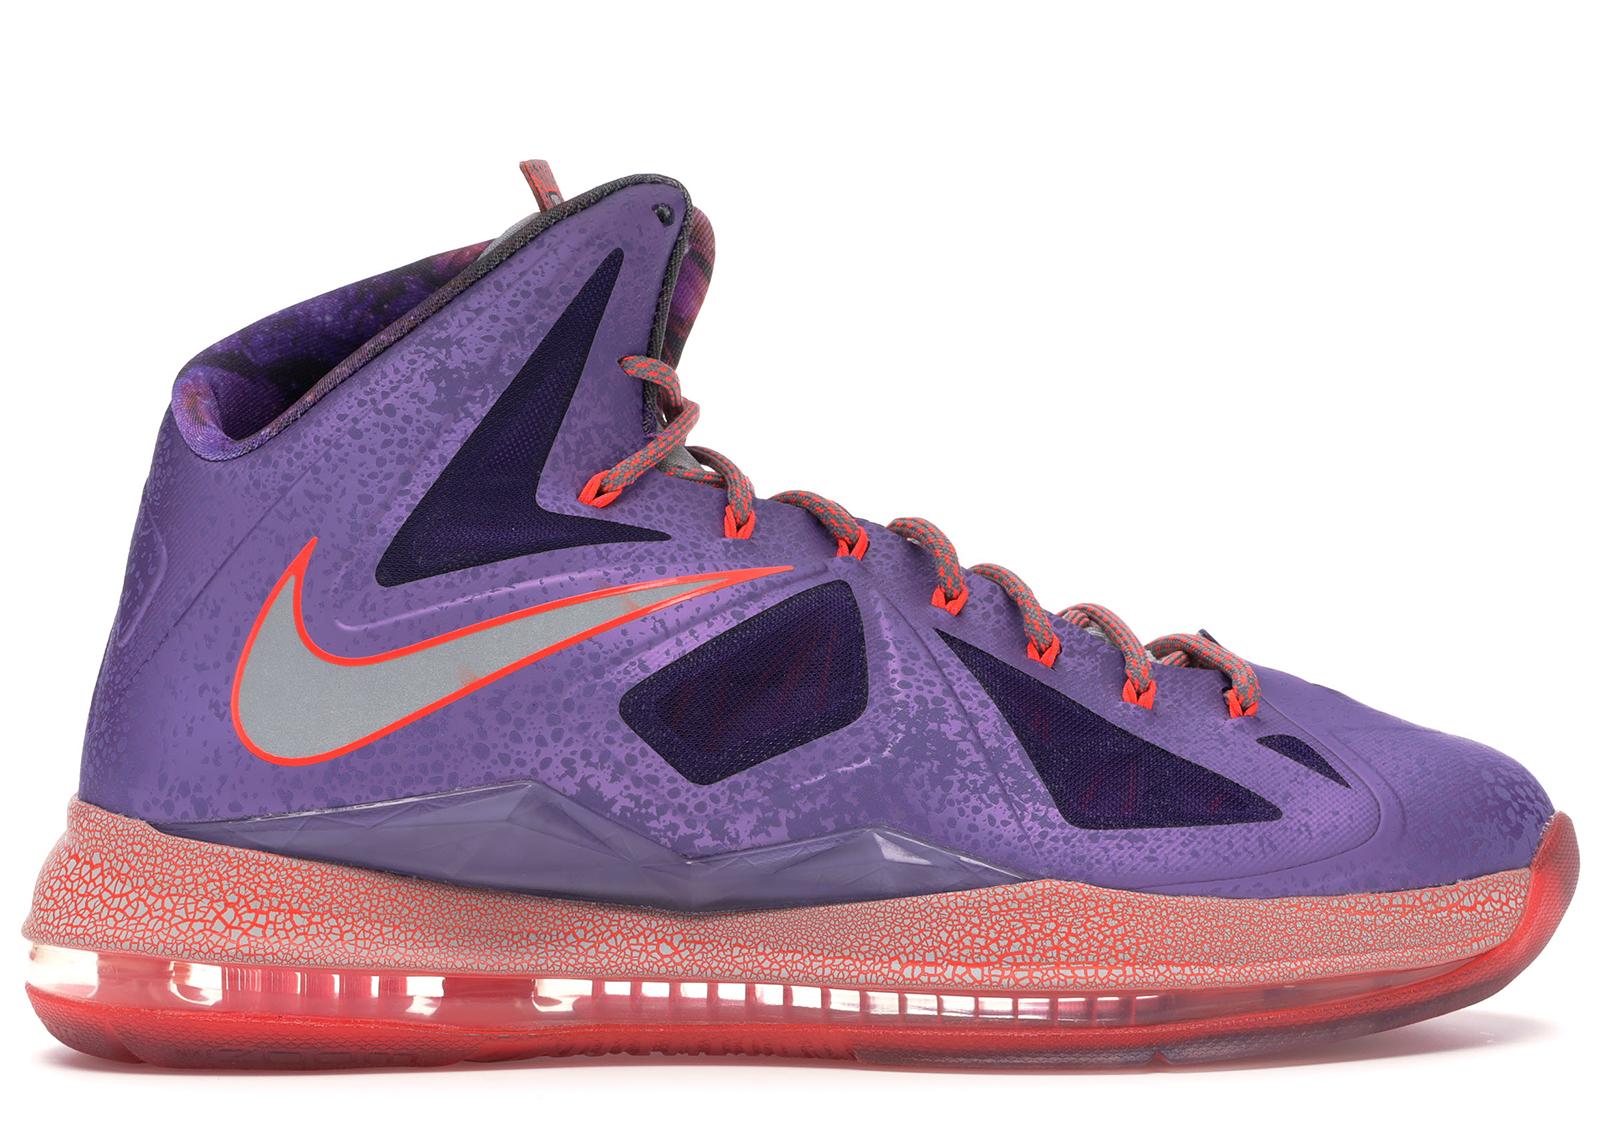 Nike LeBron X All-Star Area 72 - 583108-500